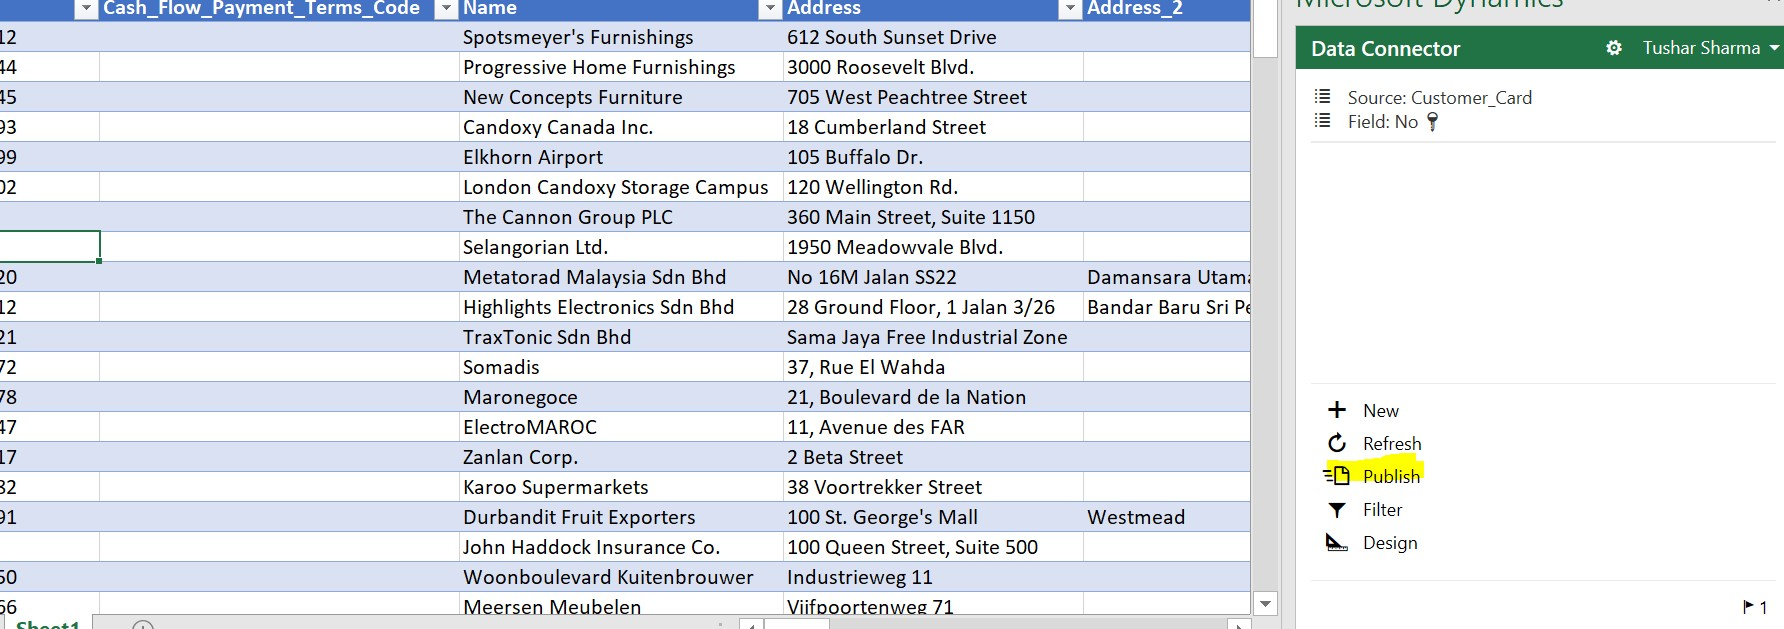 D365 Business Central - Edit in Excel Publish